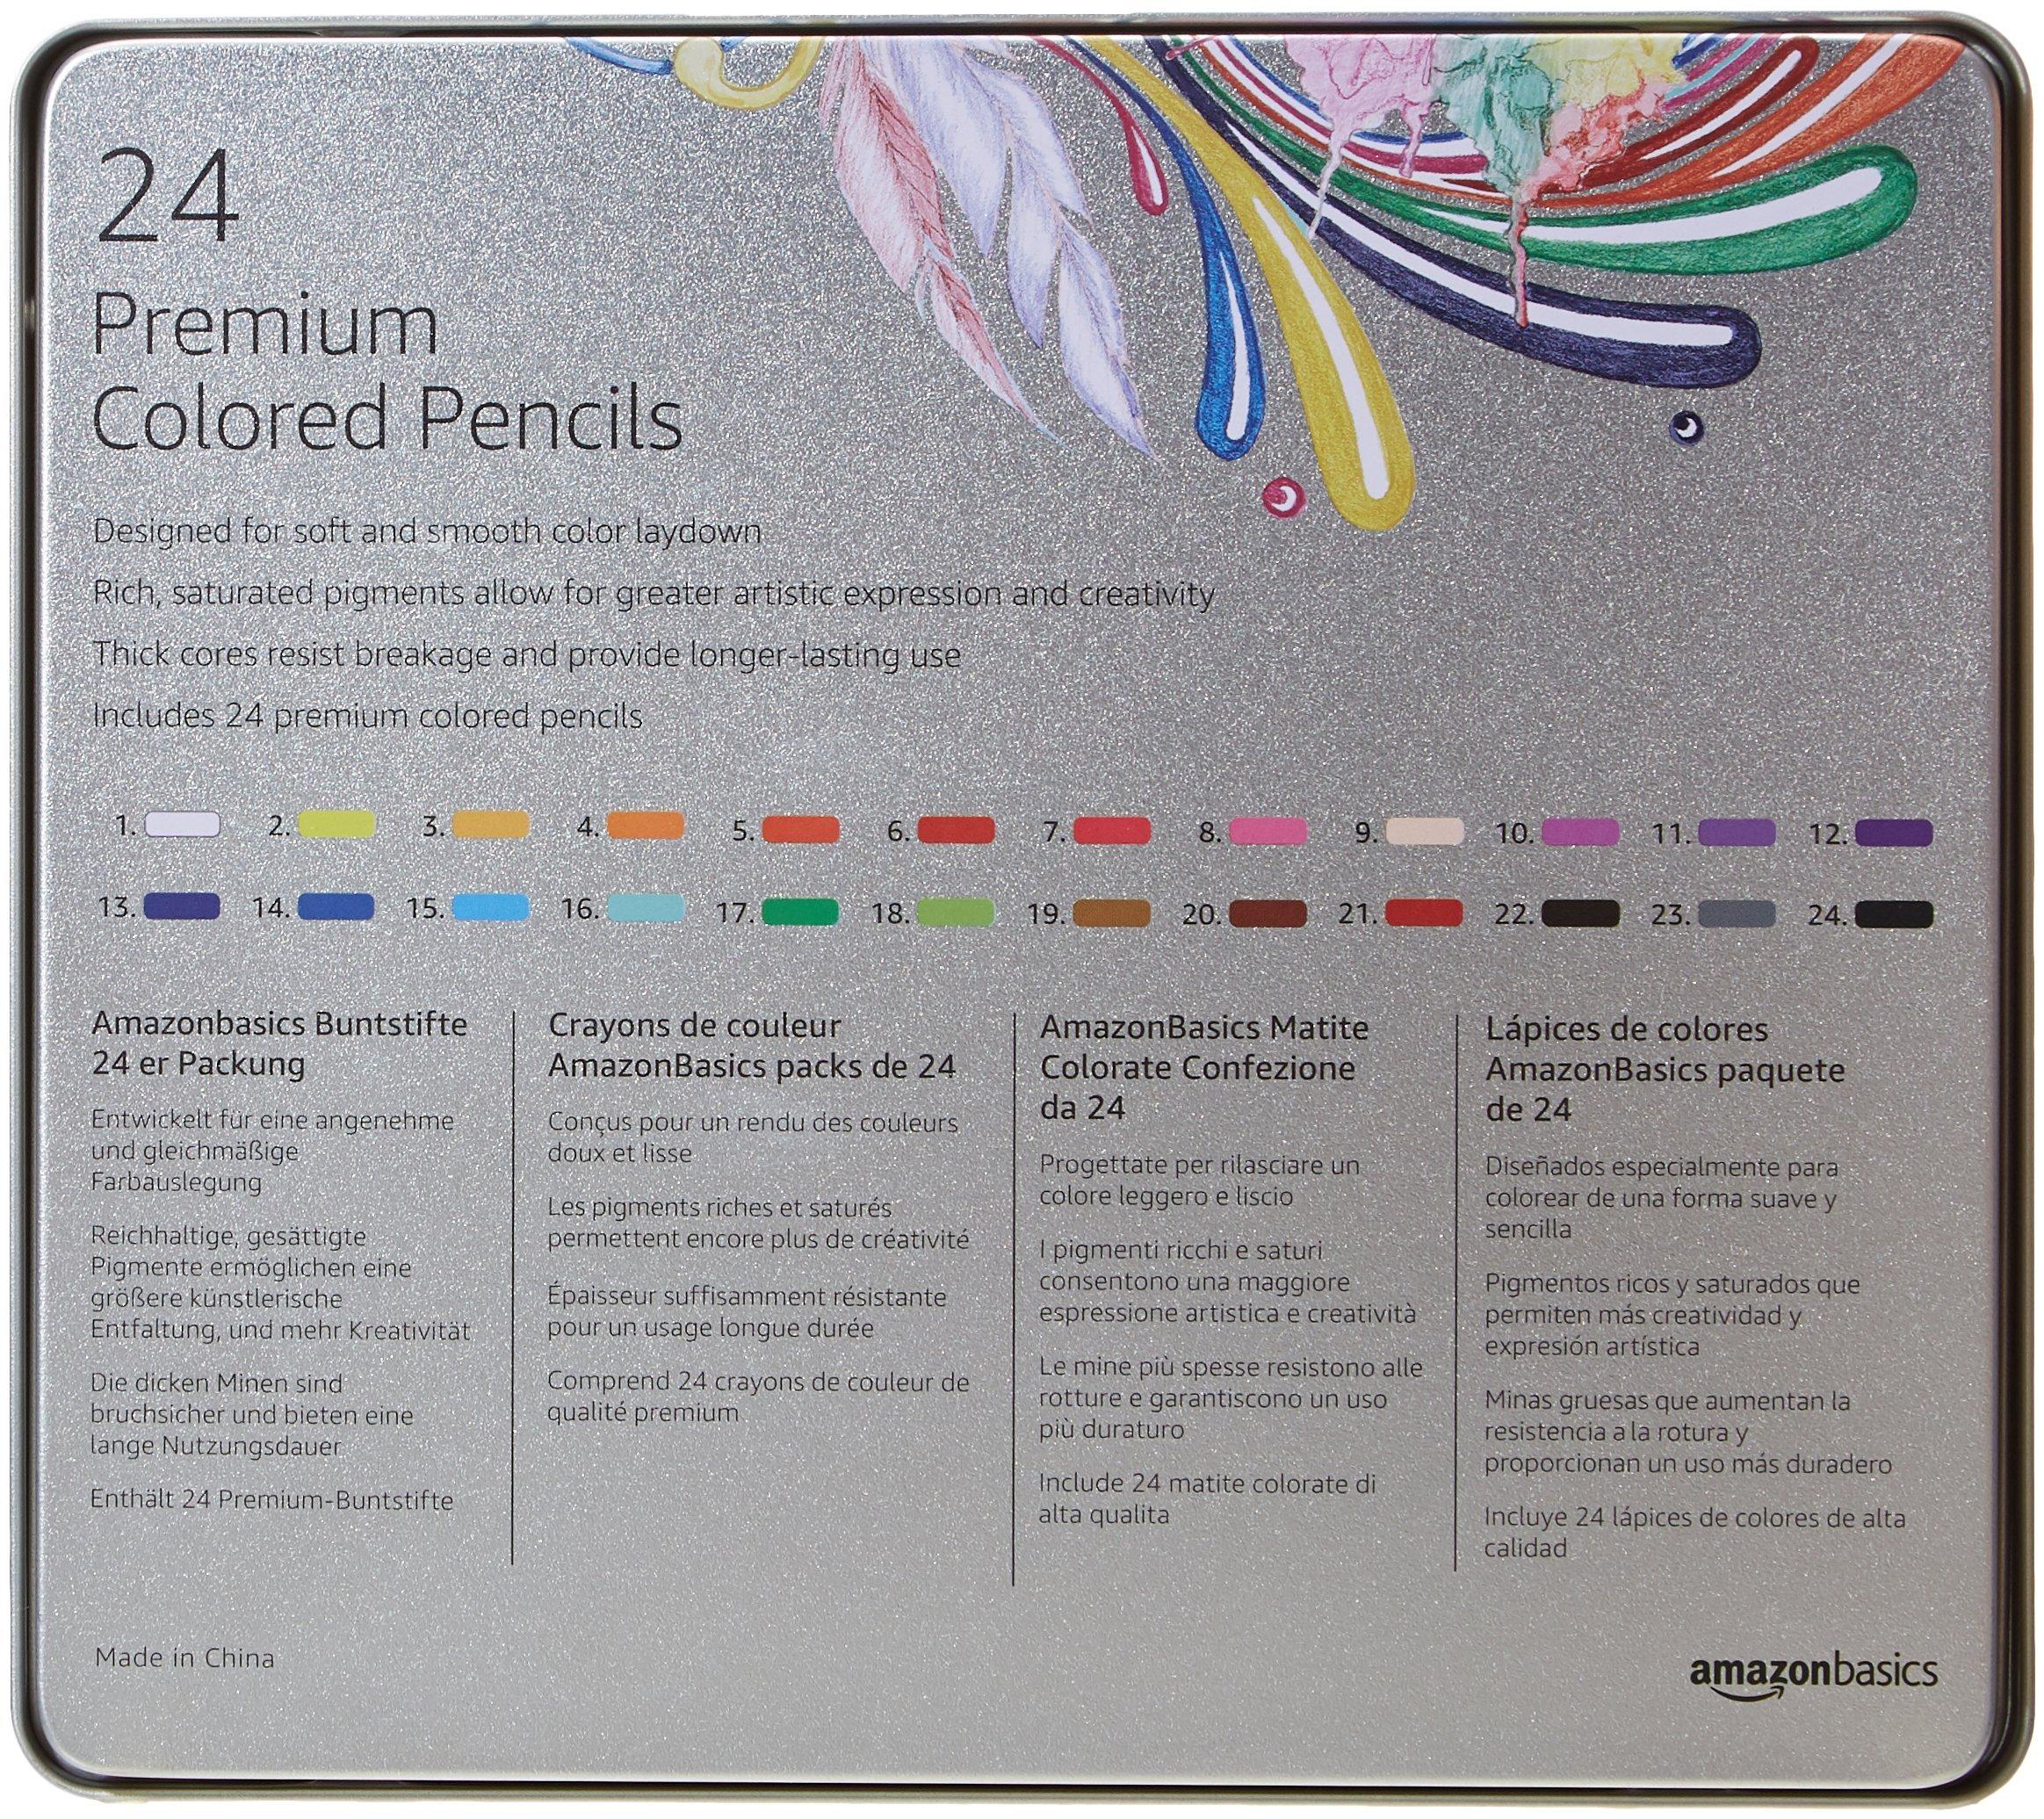 AmazonBasics Colored Pencils - 24-Count by AmazonBasics (Image #6)